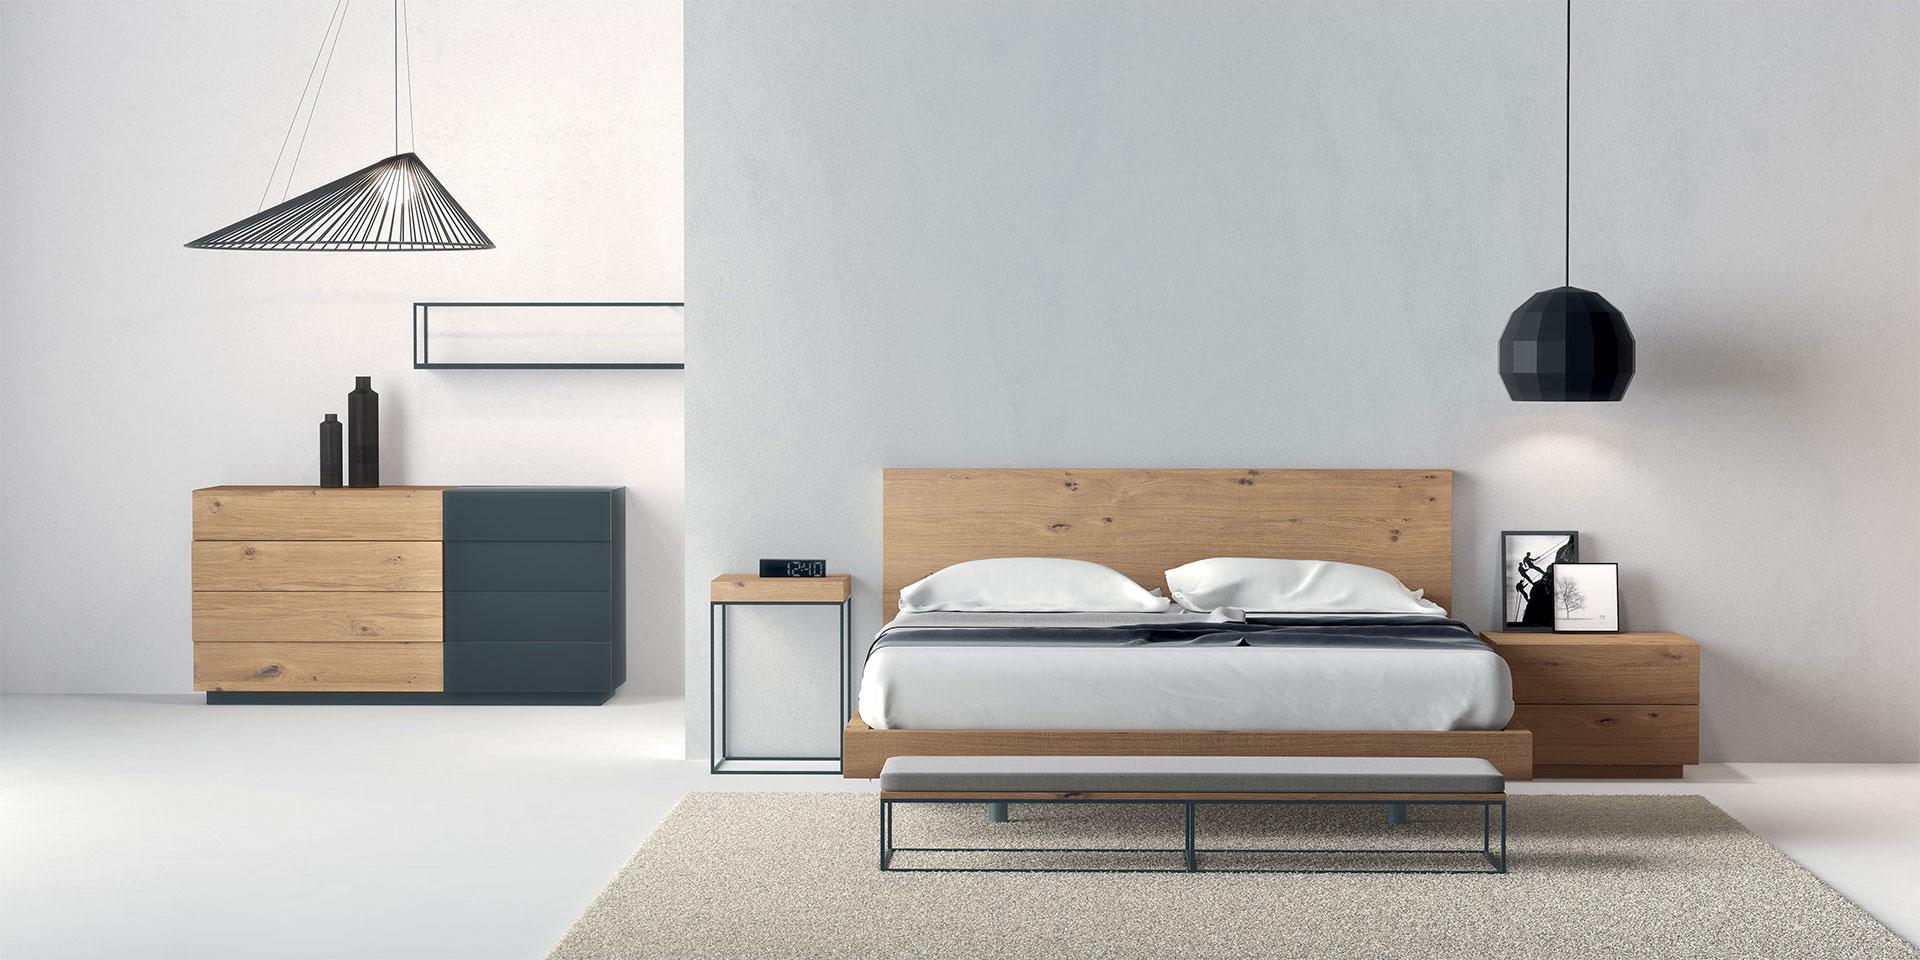 dormitorio-moderno-besform03